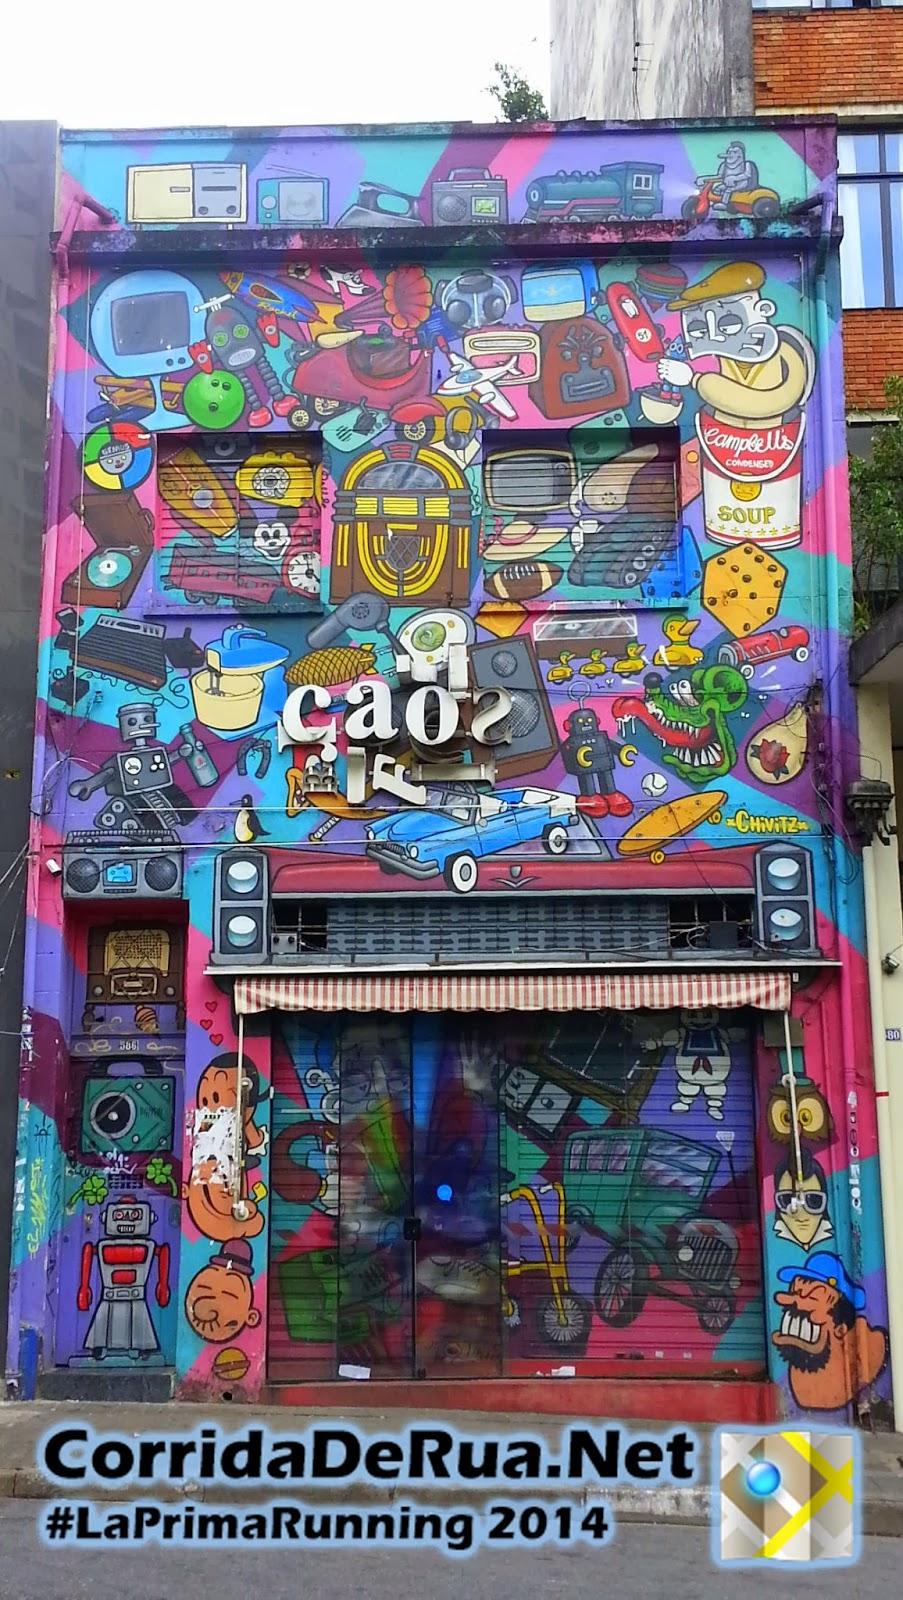 Gratitti,Graffitti,Grafite ou Street Art - Corrida de Rua